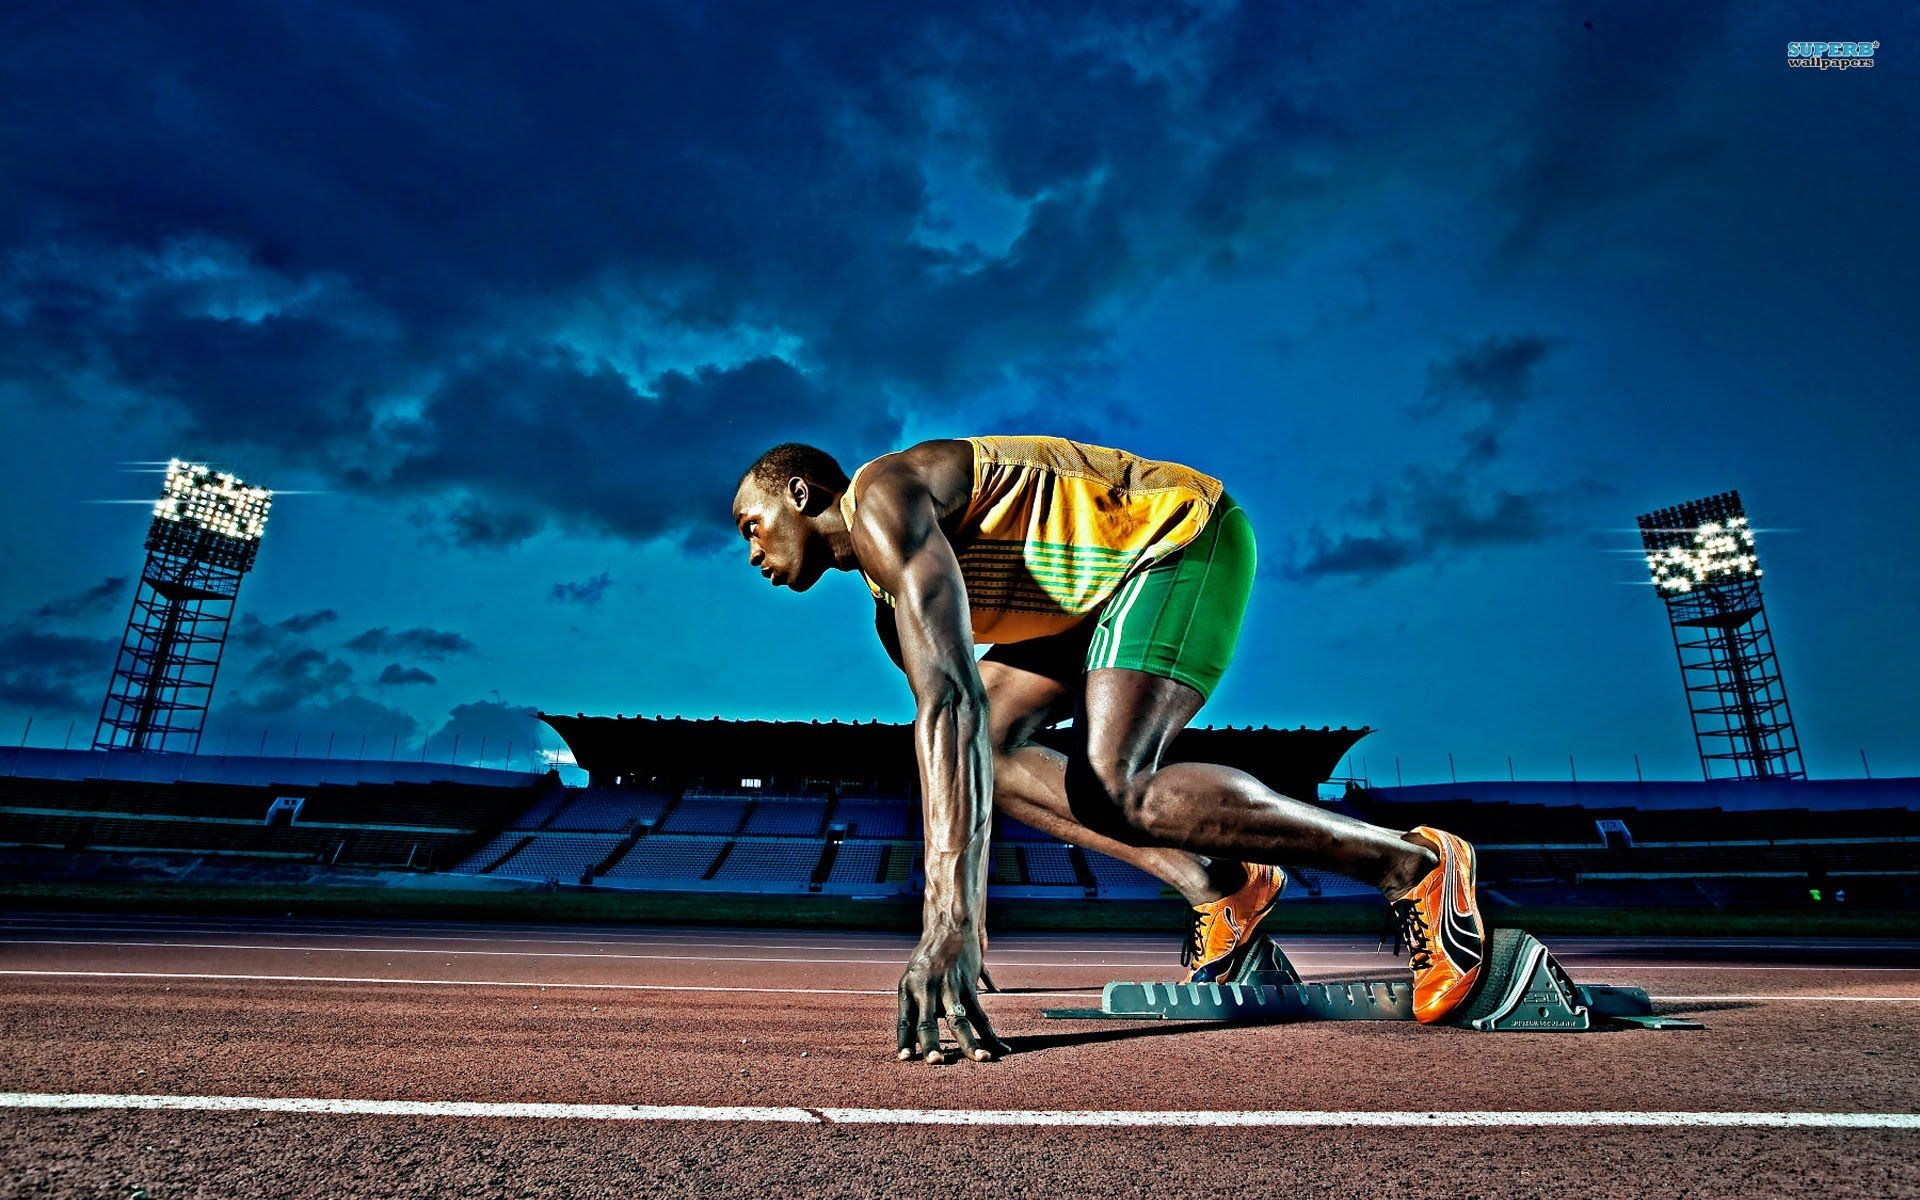 Best Running Motivational Video Motivation To Run Usain Bolt Running Motivation Best Cardio